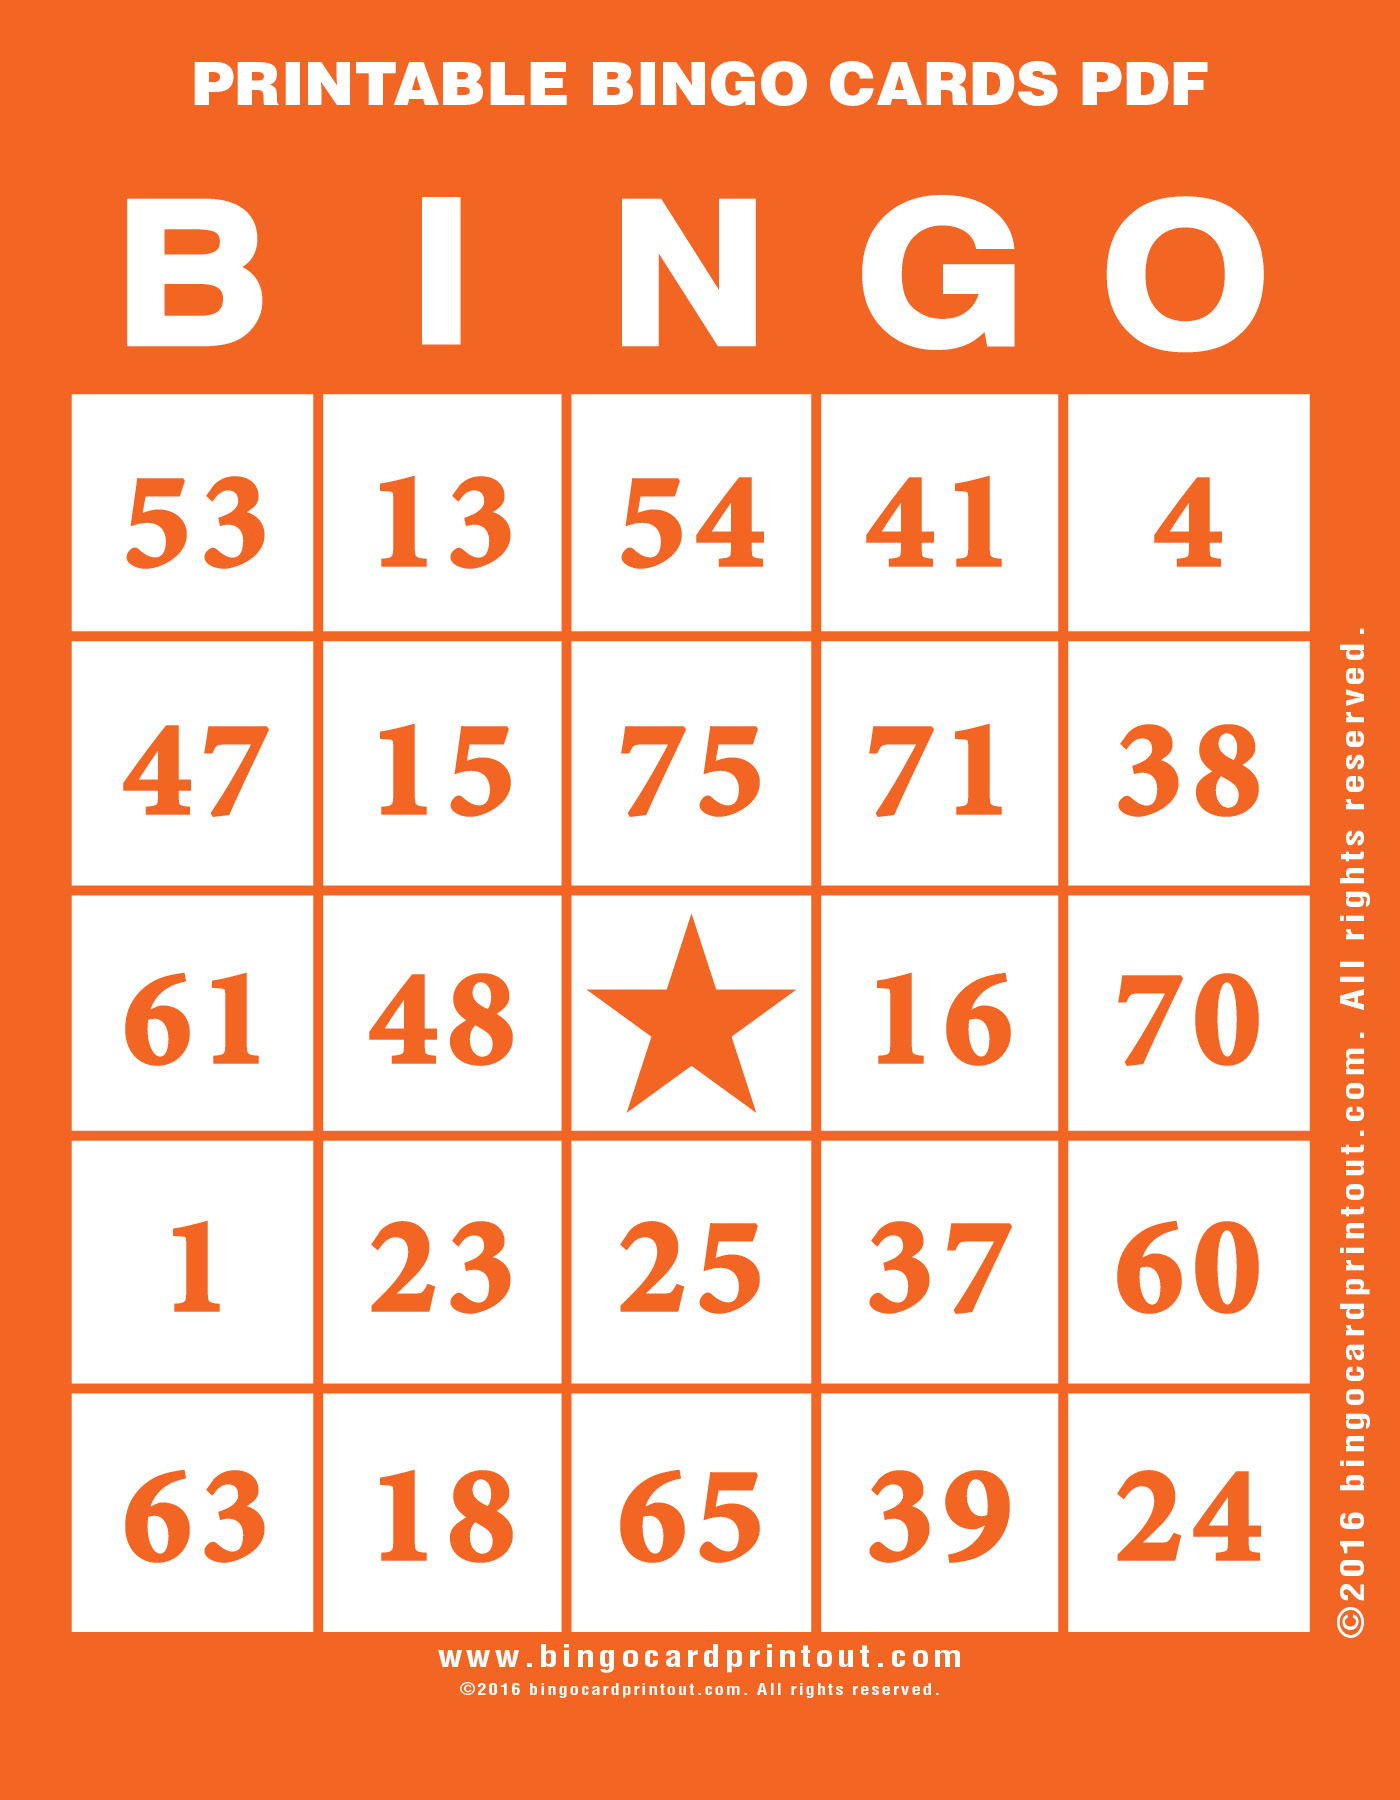 Printable Bingo Cards PDF - BingoCardPrintout.com For Blank Bingo Template Pdf